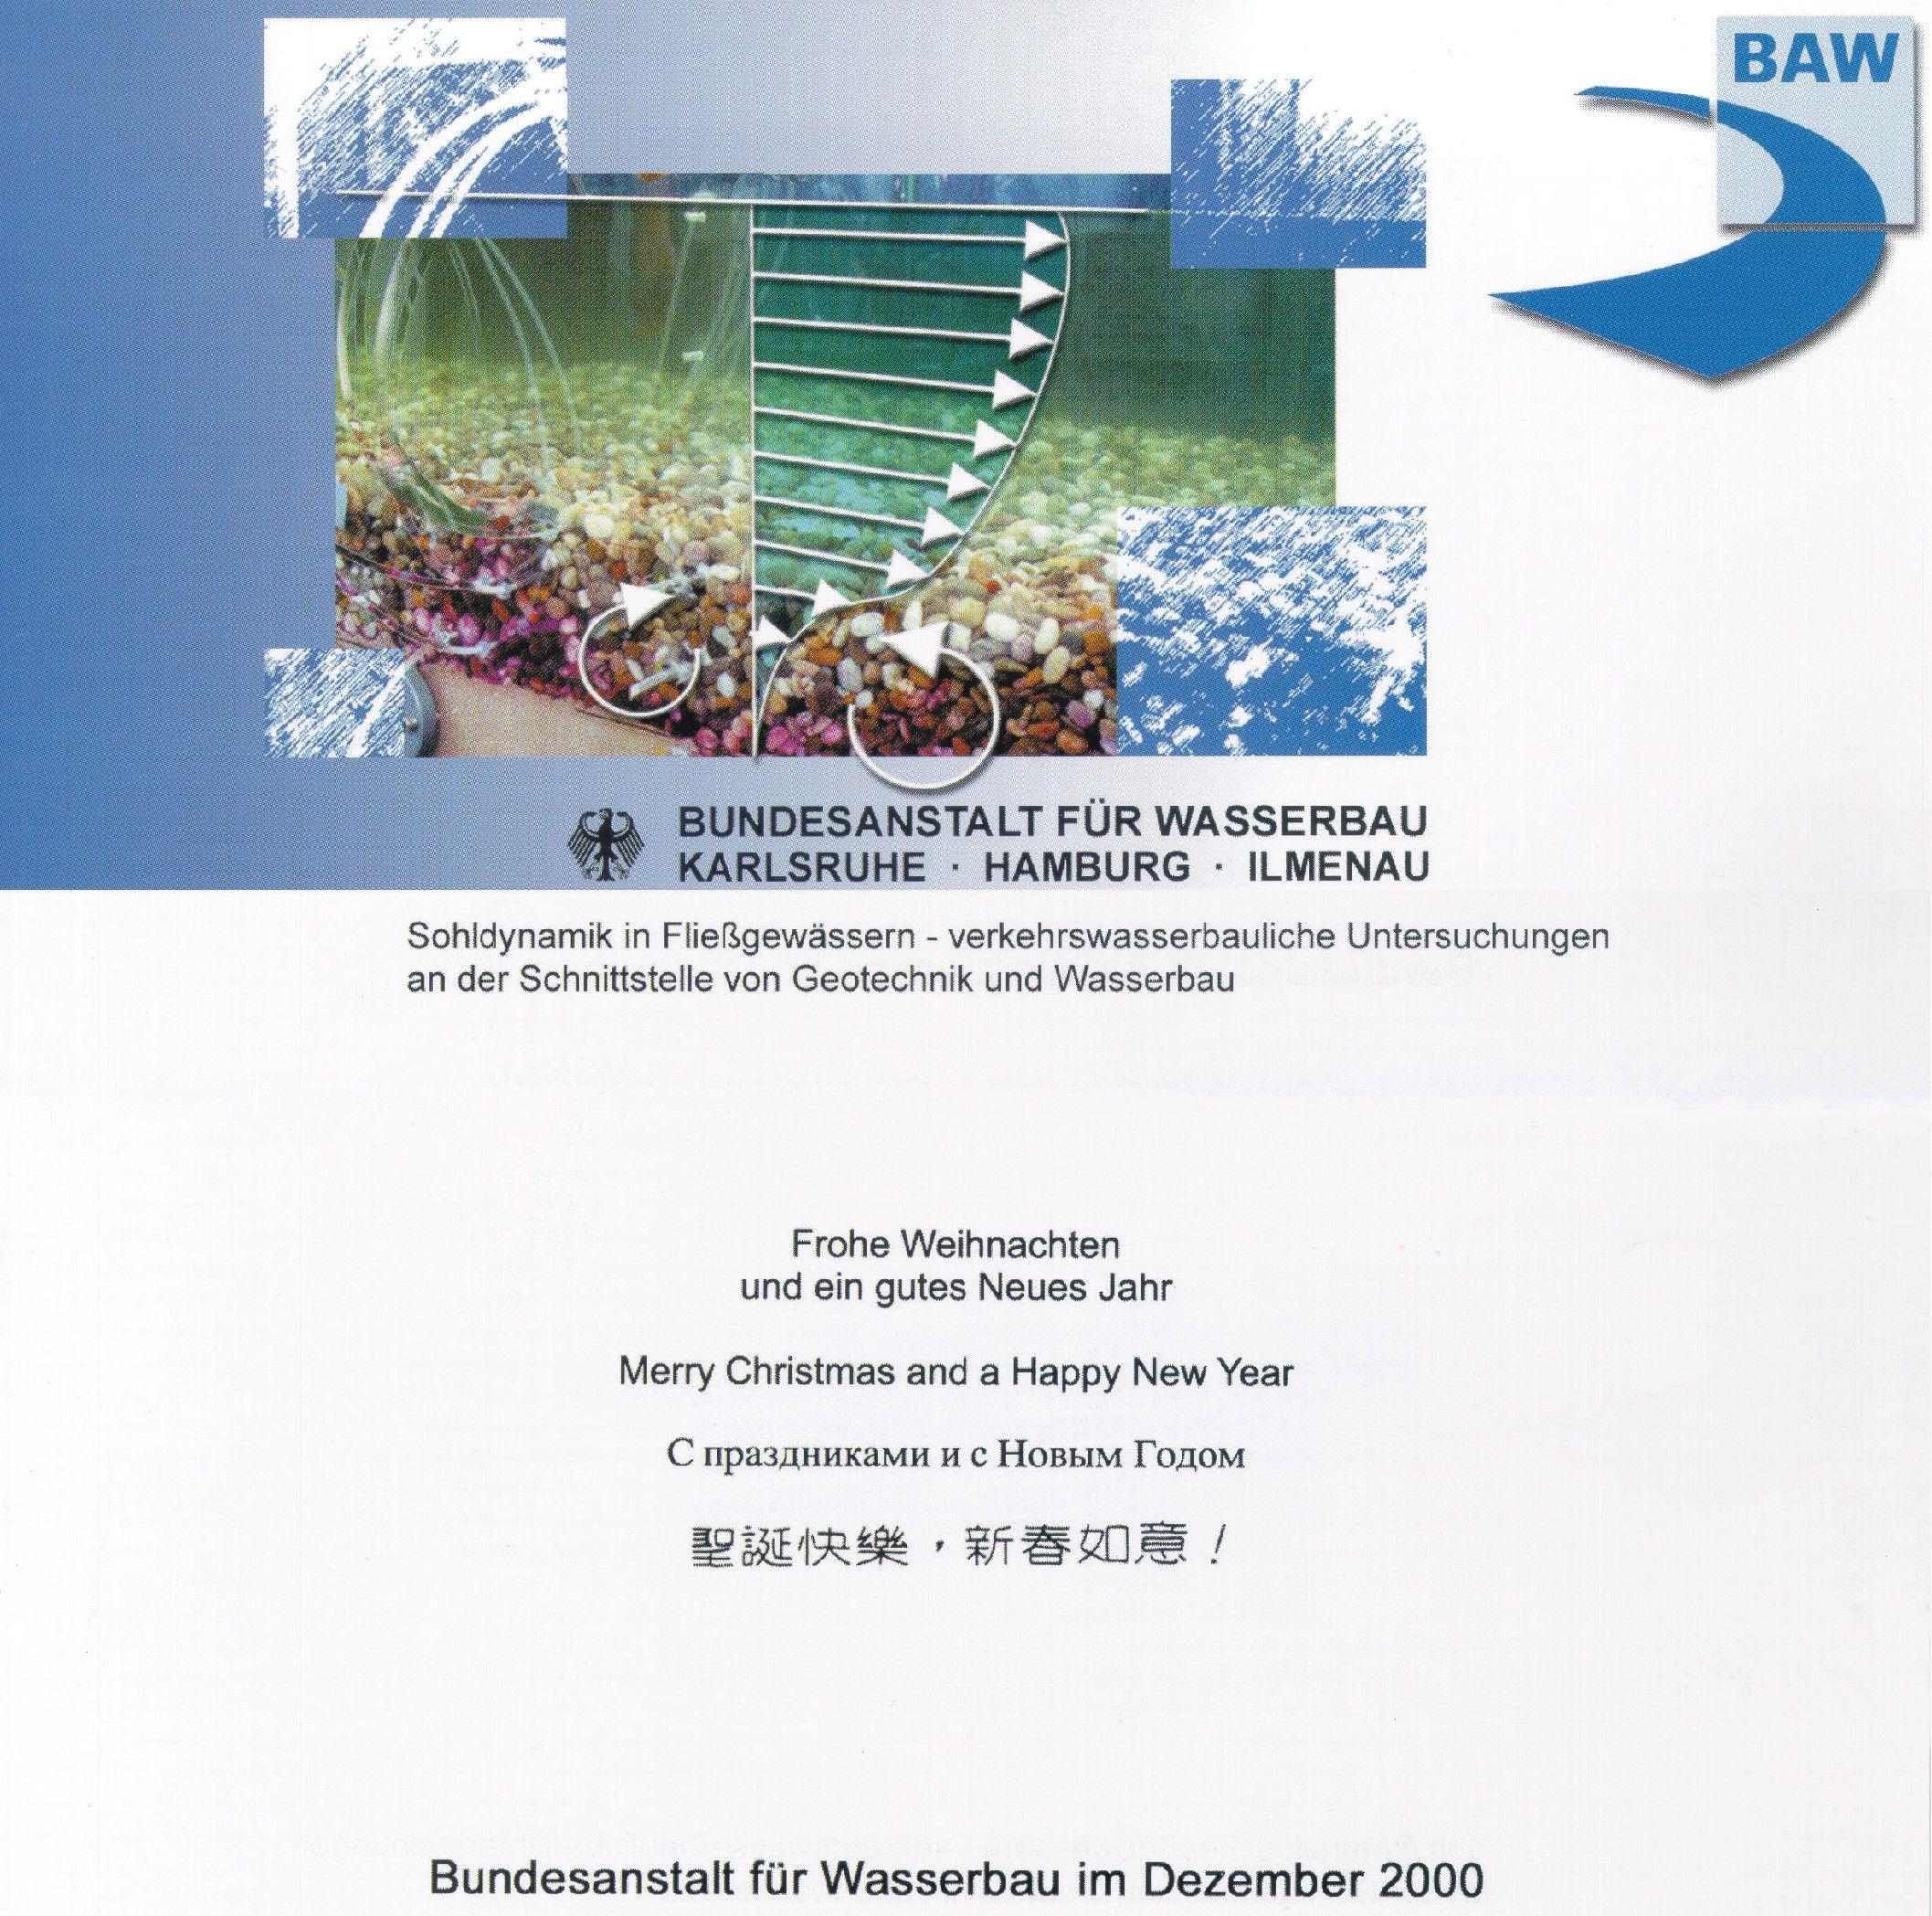 ChristmascardBAW2000